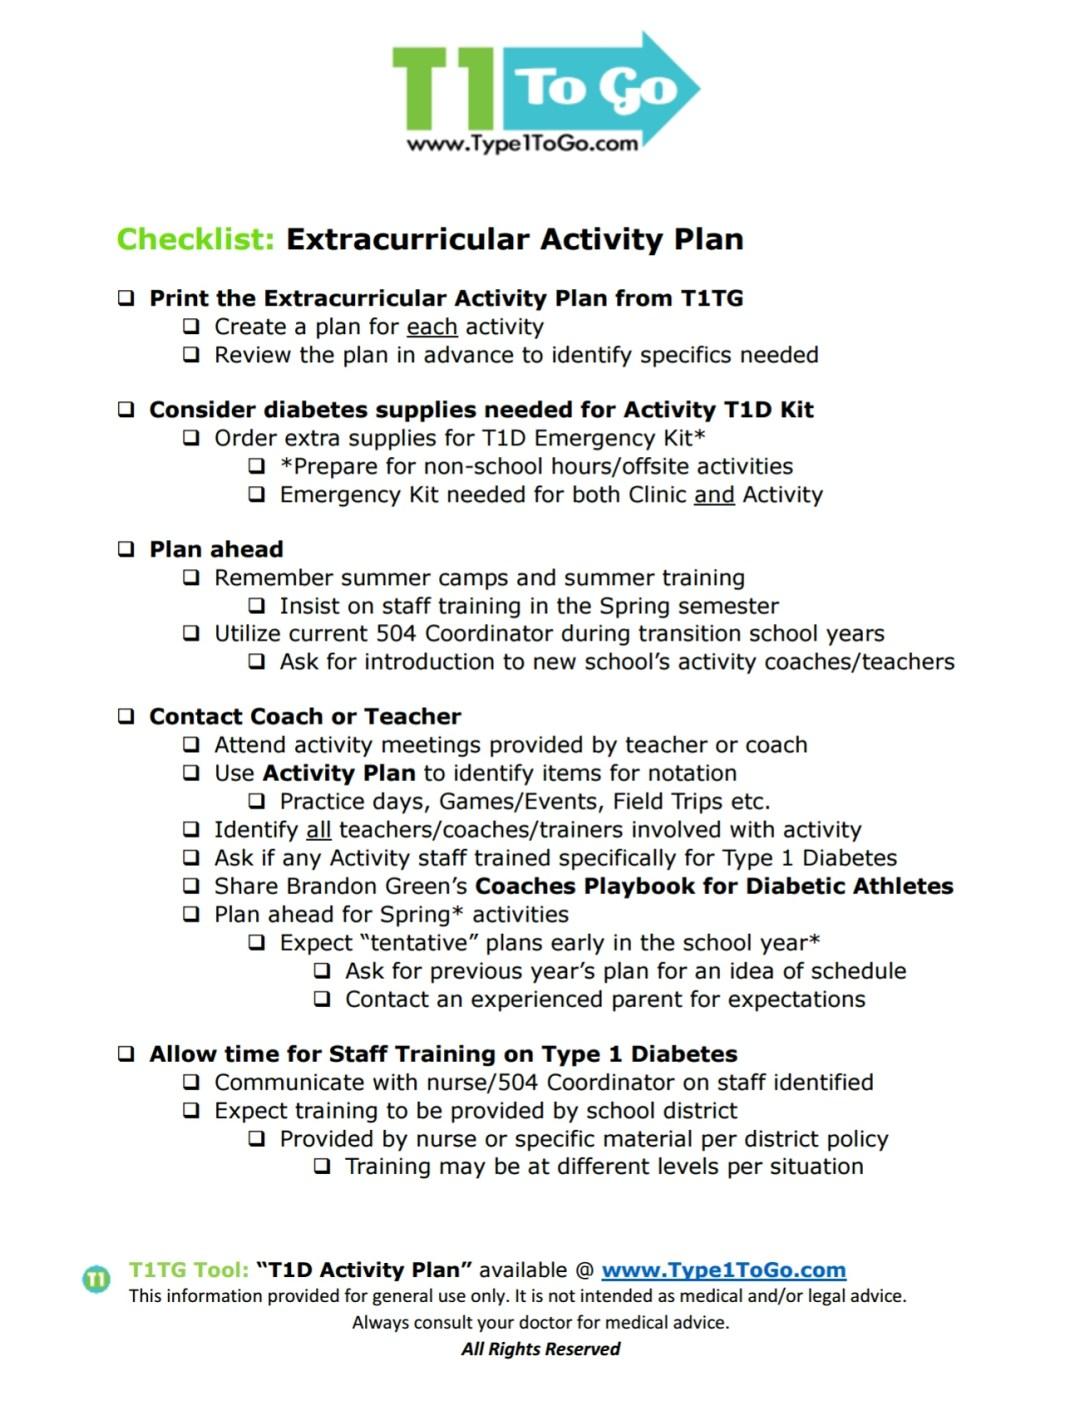 Type 1 Diabetes Extracurricular Activities Checklist